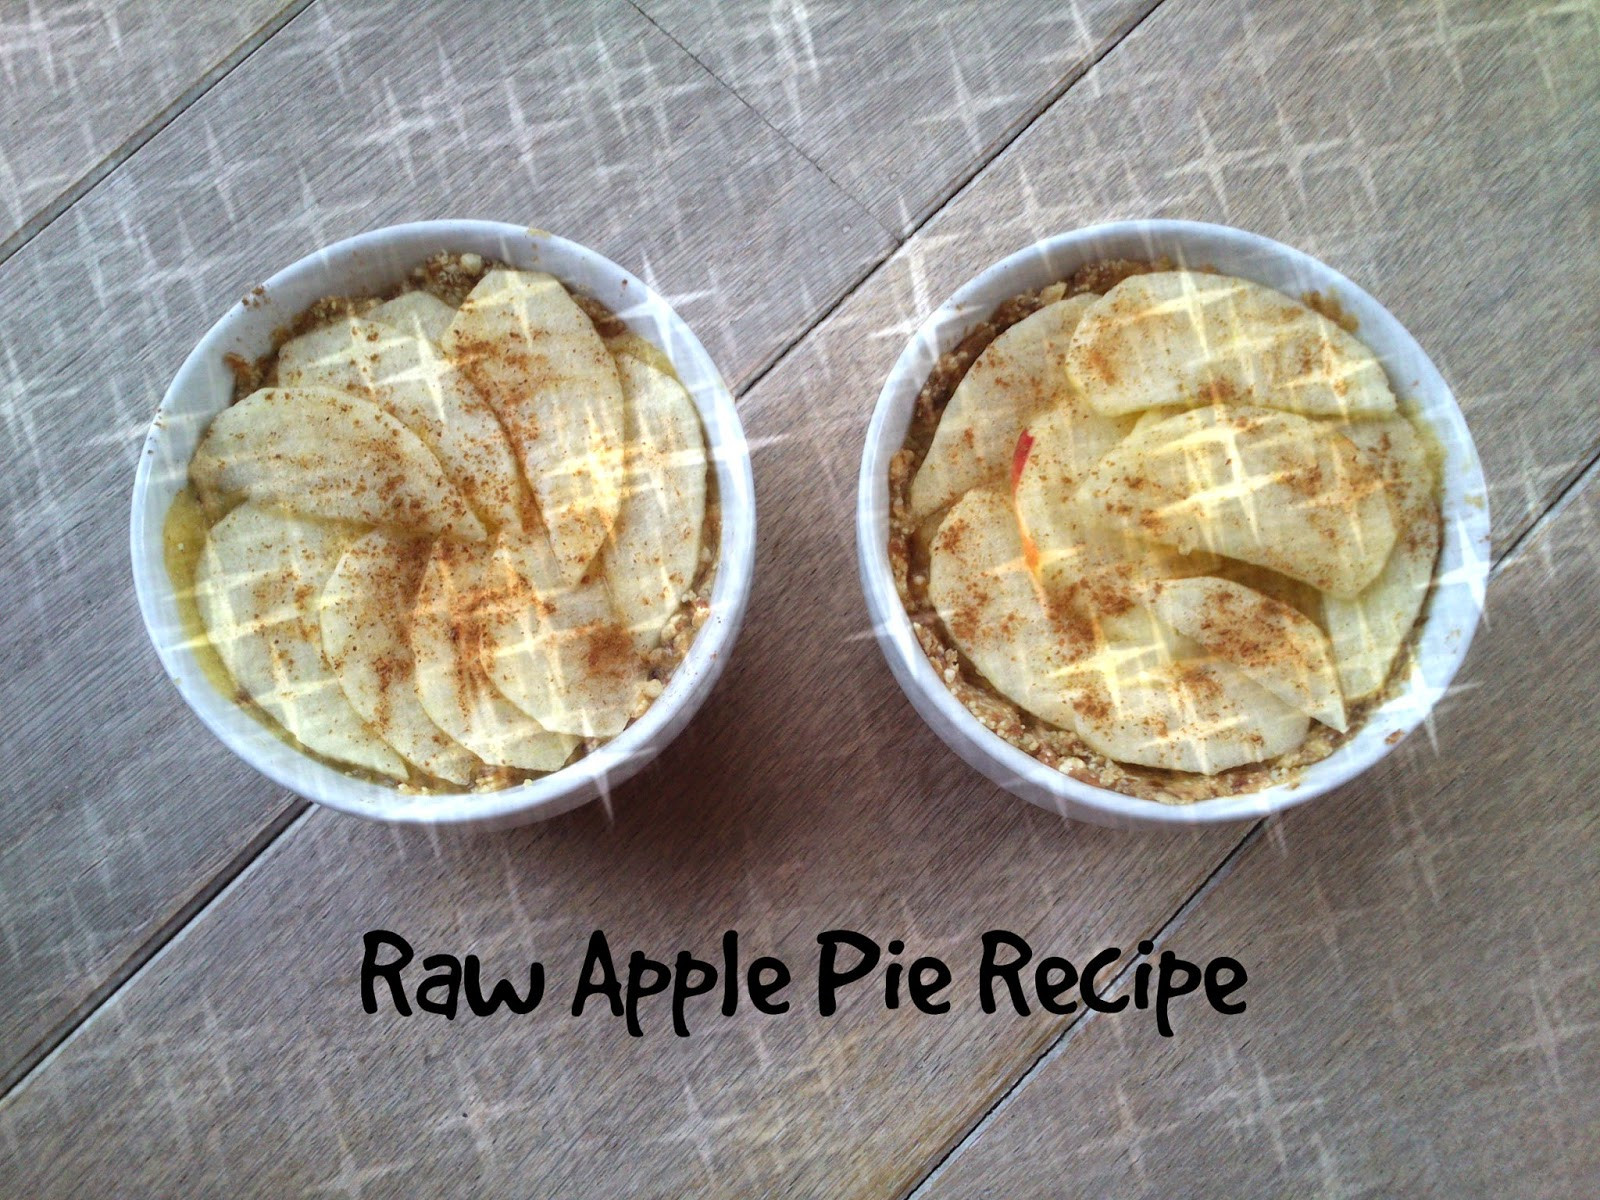 Organic Apple Pie Recipe  MyMissDiorFashion Raw Food apple pie recipe